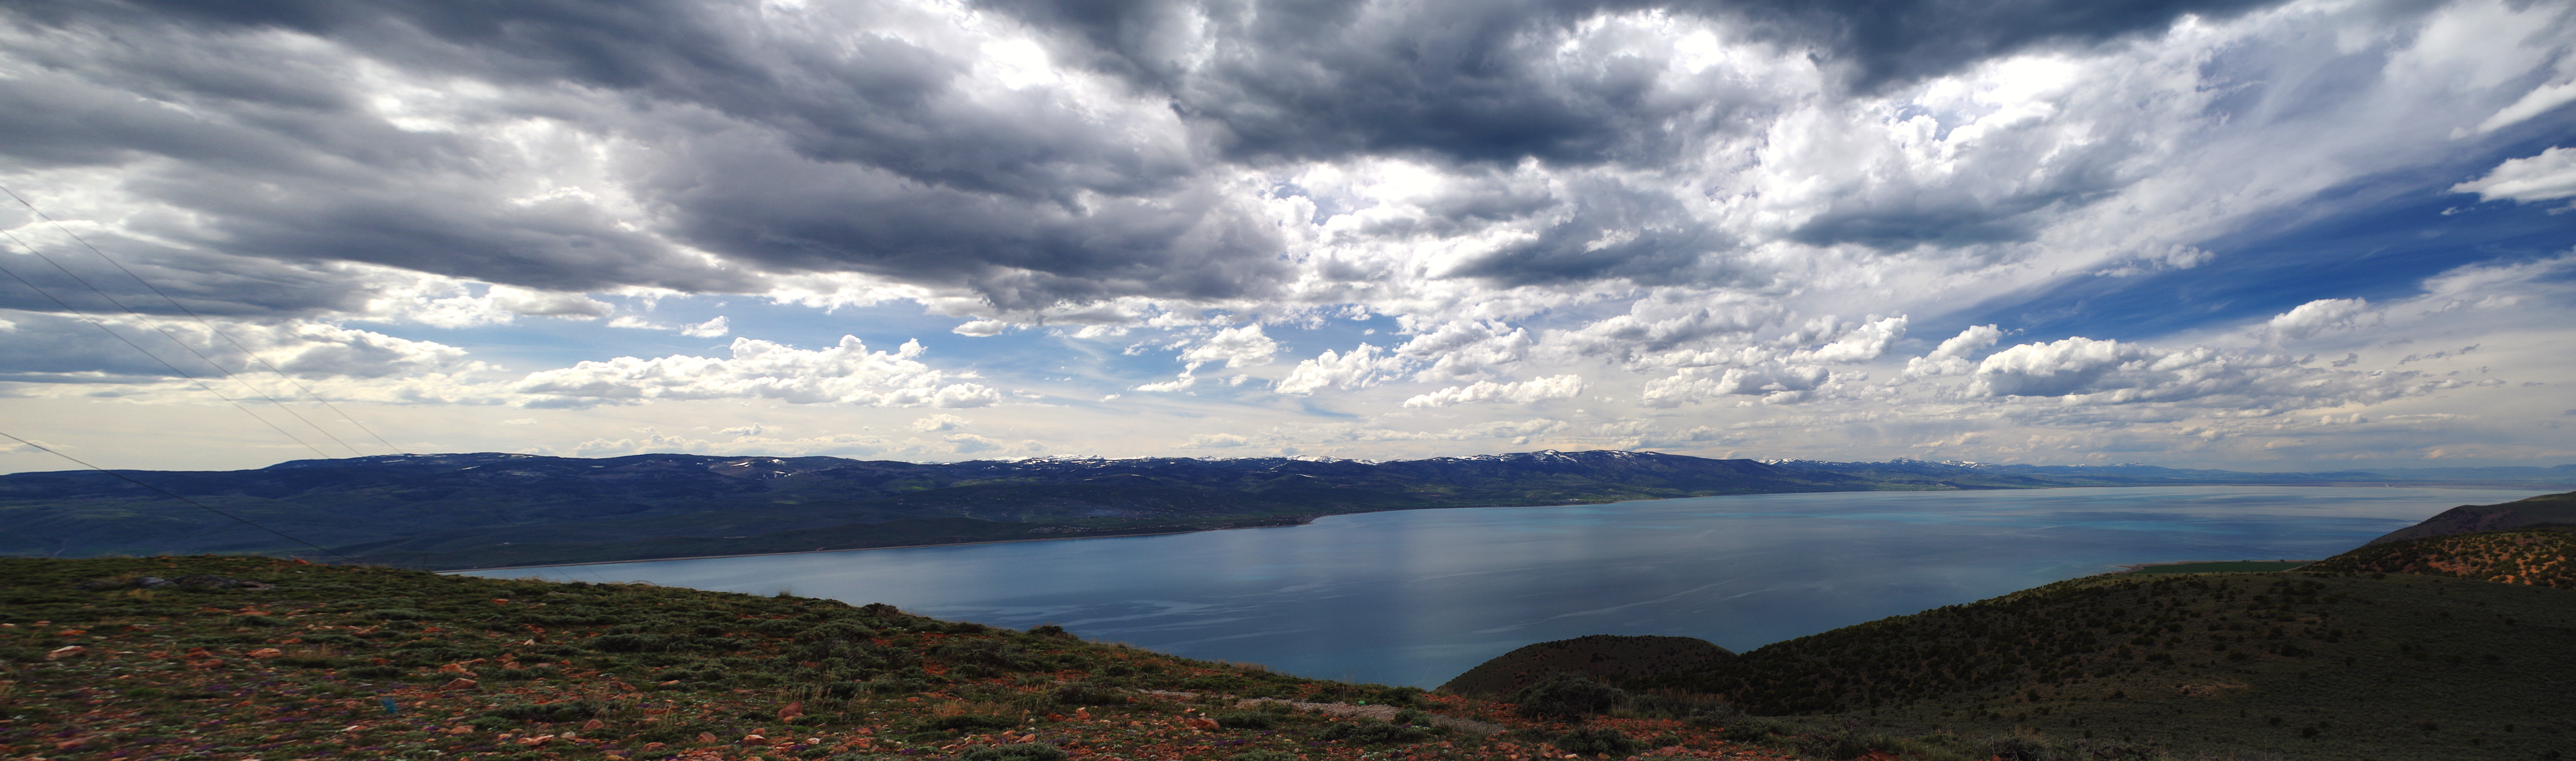 Besr_Lake_Panorama14